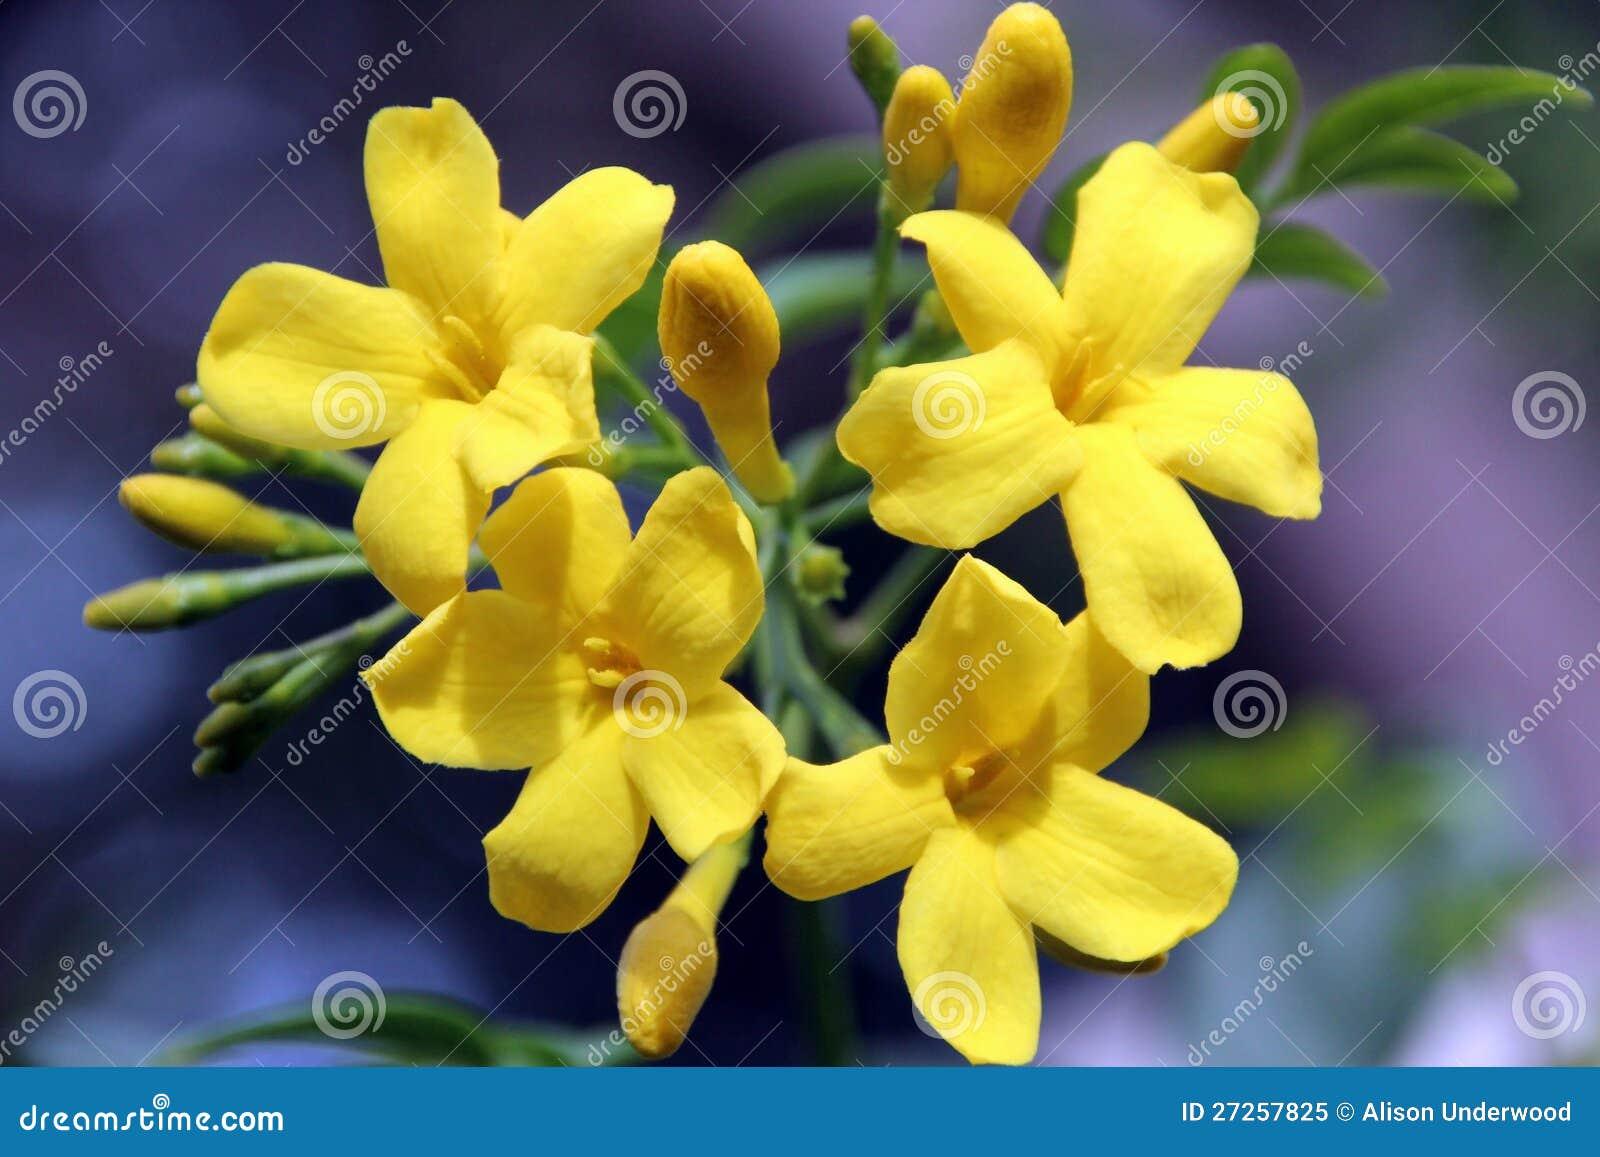 Carolina Yellow Jasmine Flowers Stock Image Image Of Buds Cluster